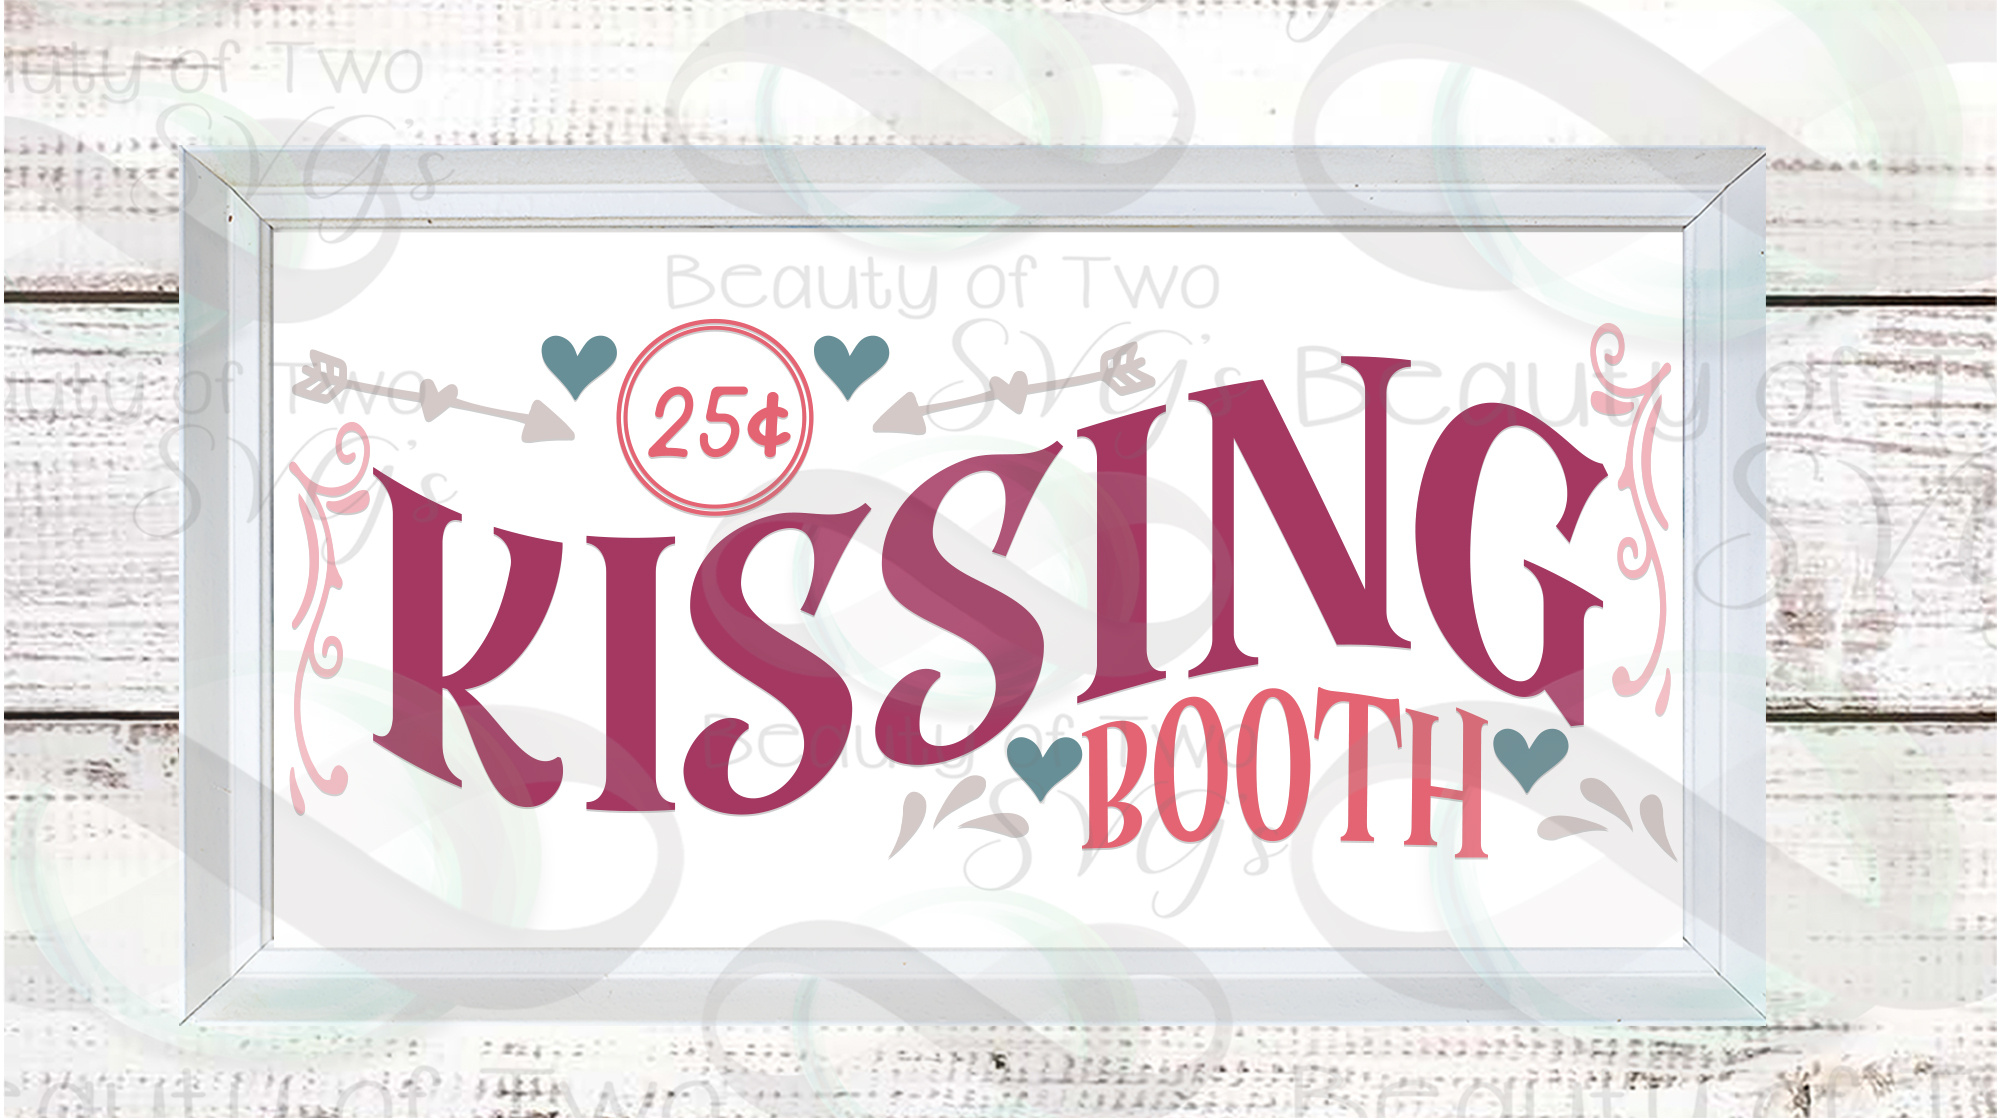 Valentines Kissing Booth svg, Valentines sign design svg example image 3